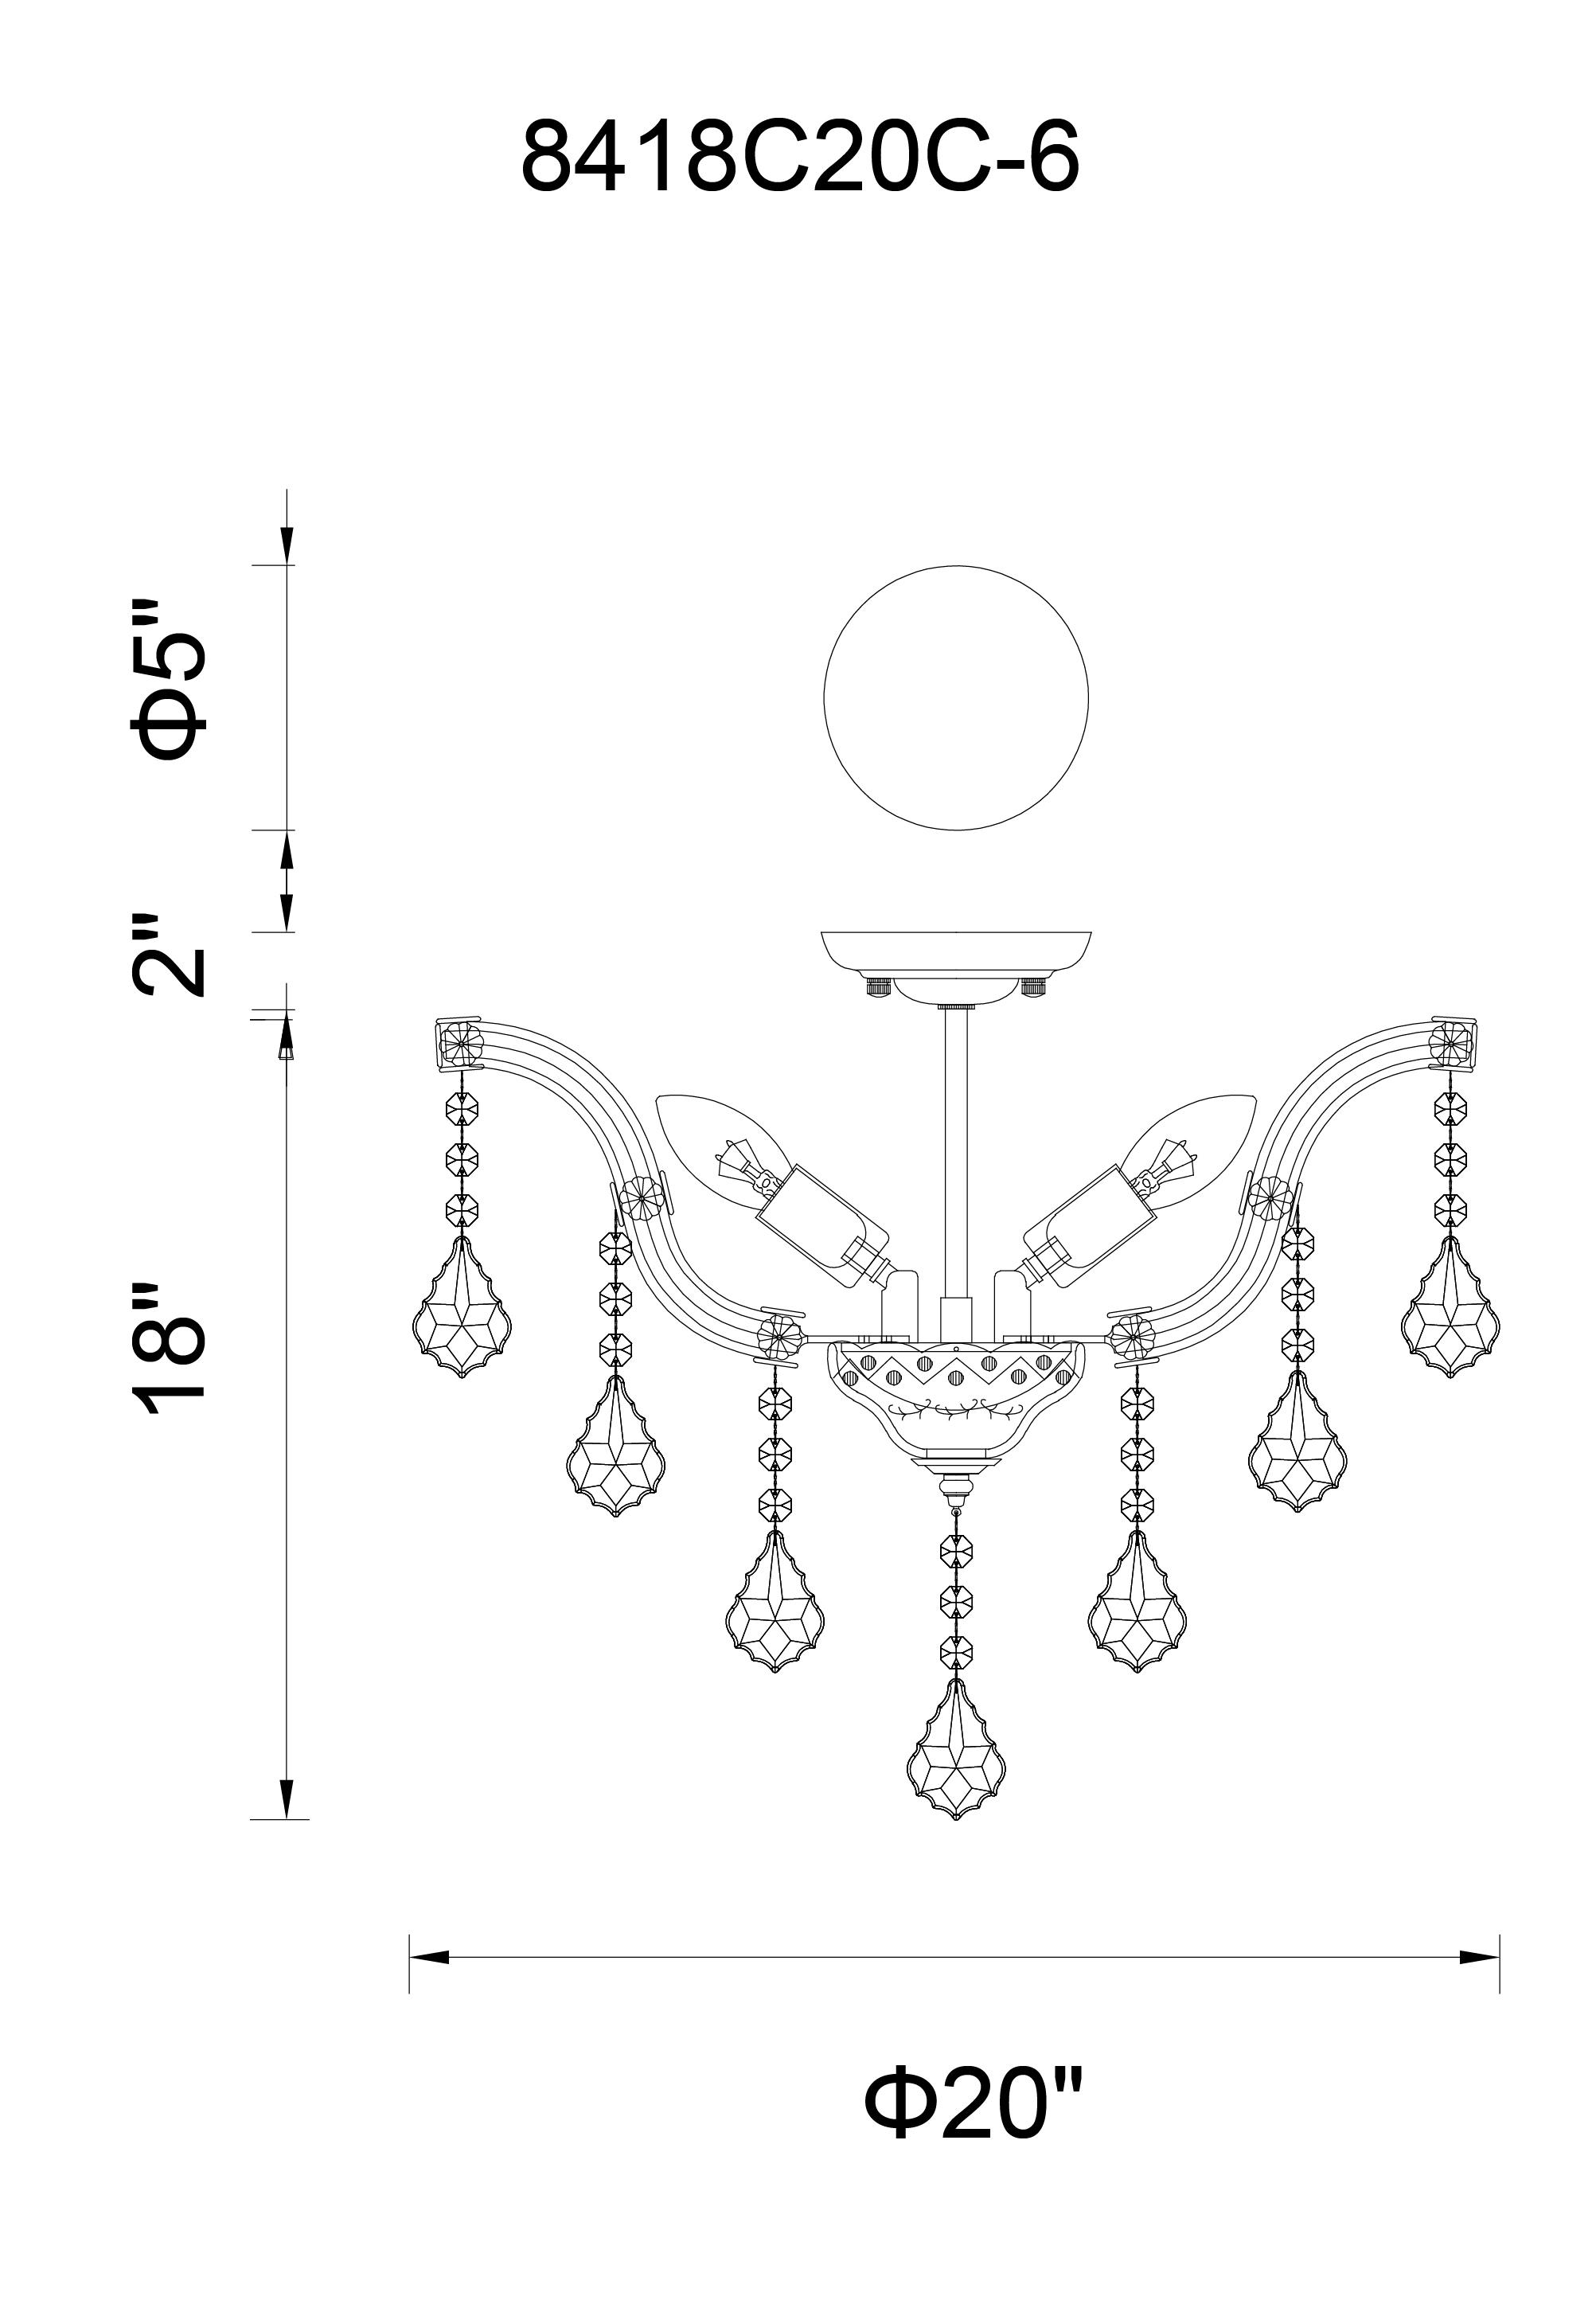 CWI Lighting Payton 6 Light Flush Mount With Chrome Finish Model: 8418C20C-6(CLEAR) Line Drawing